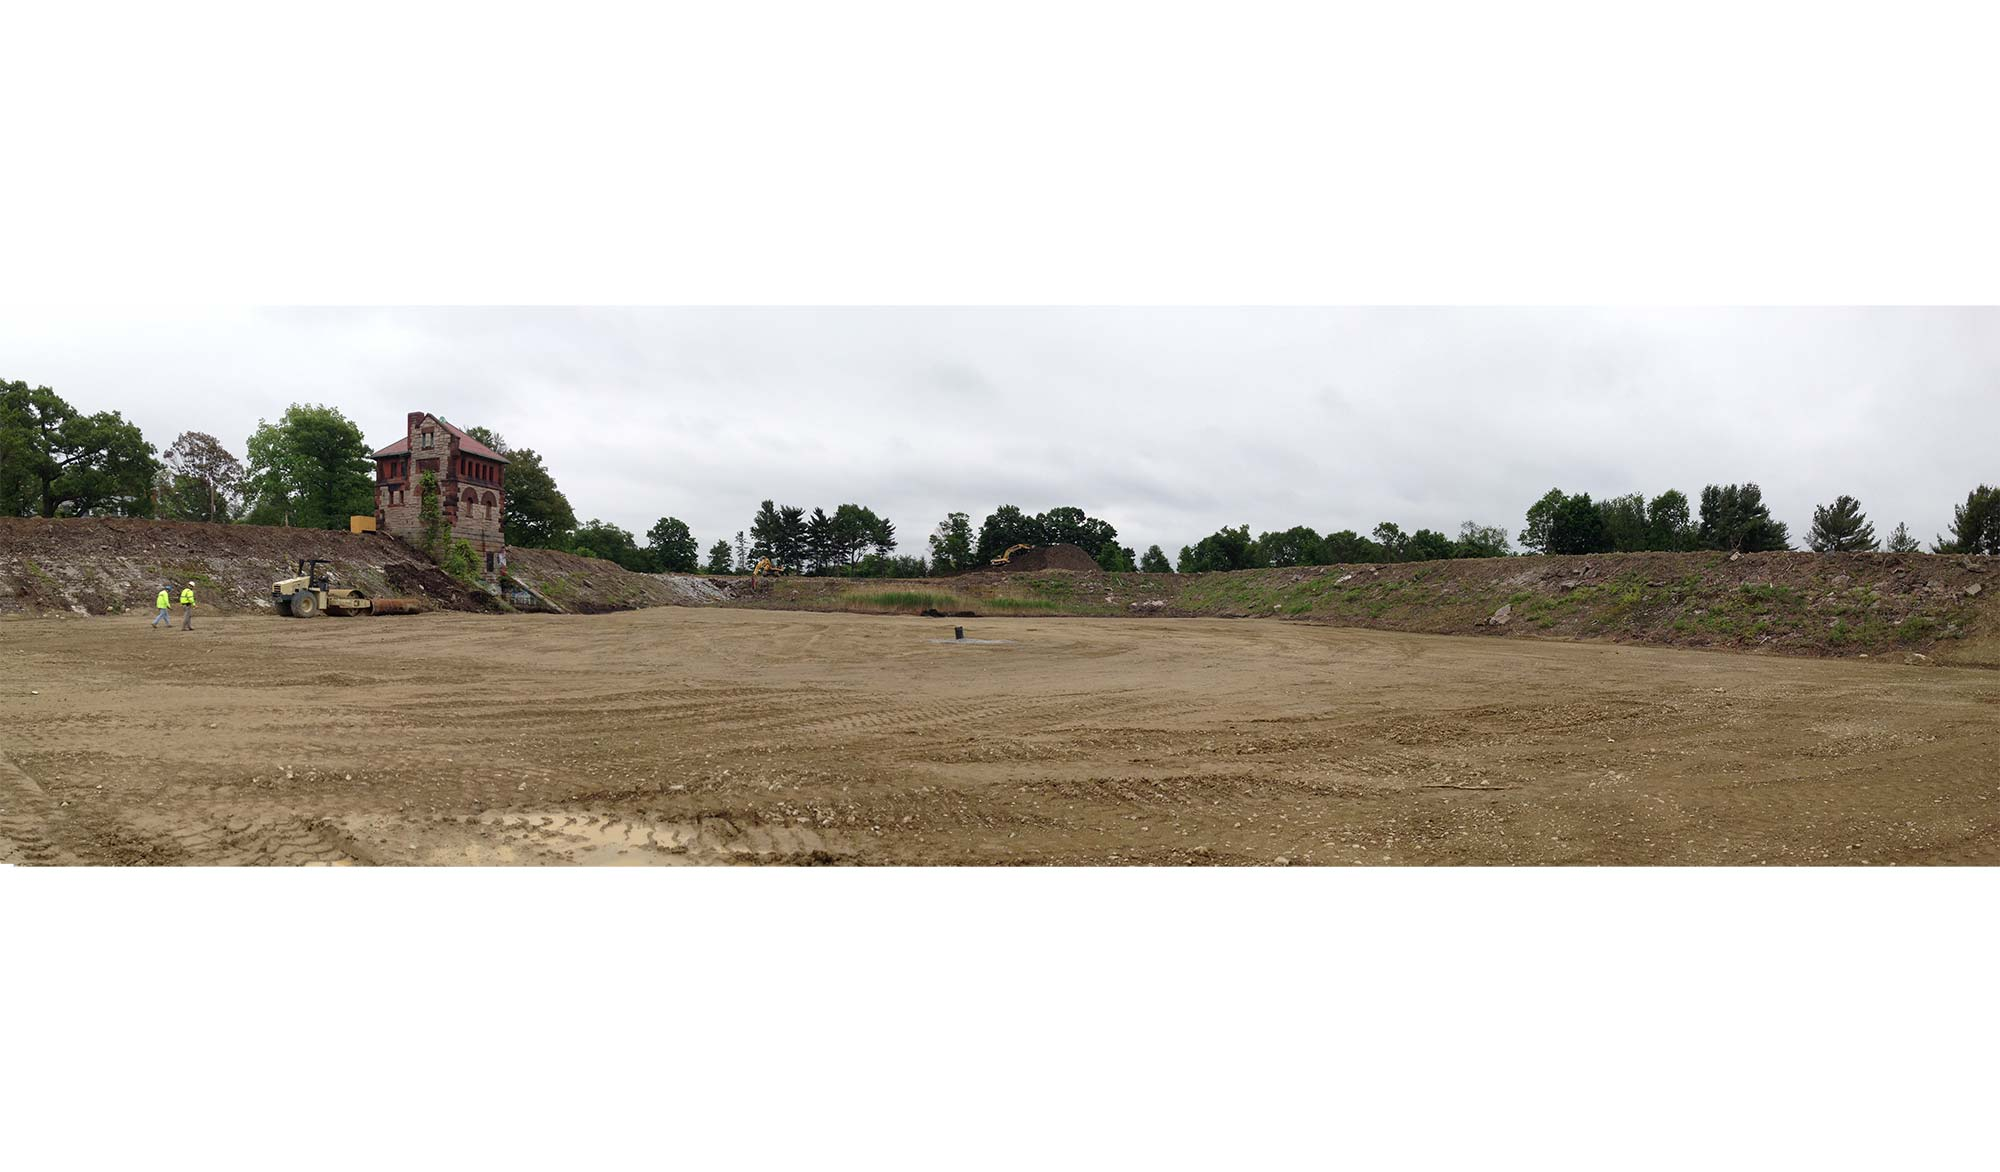 panorama from field.jpg